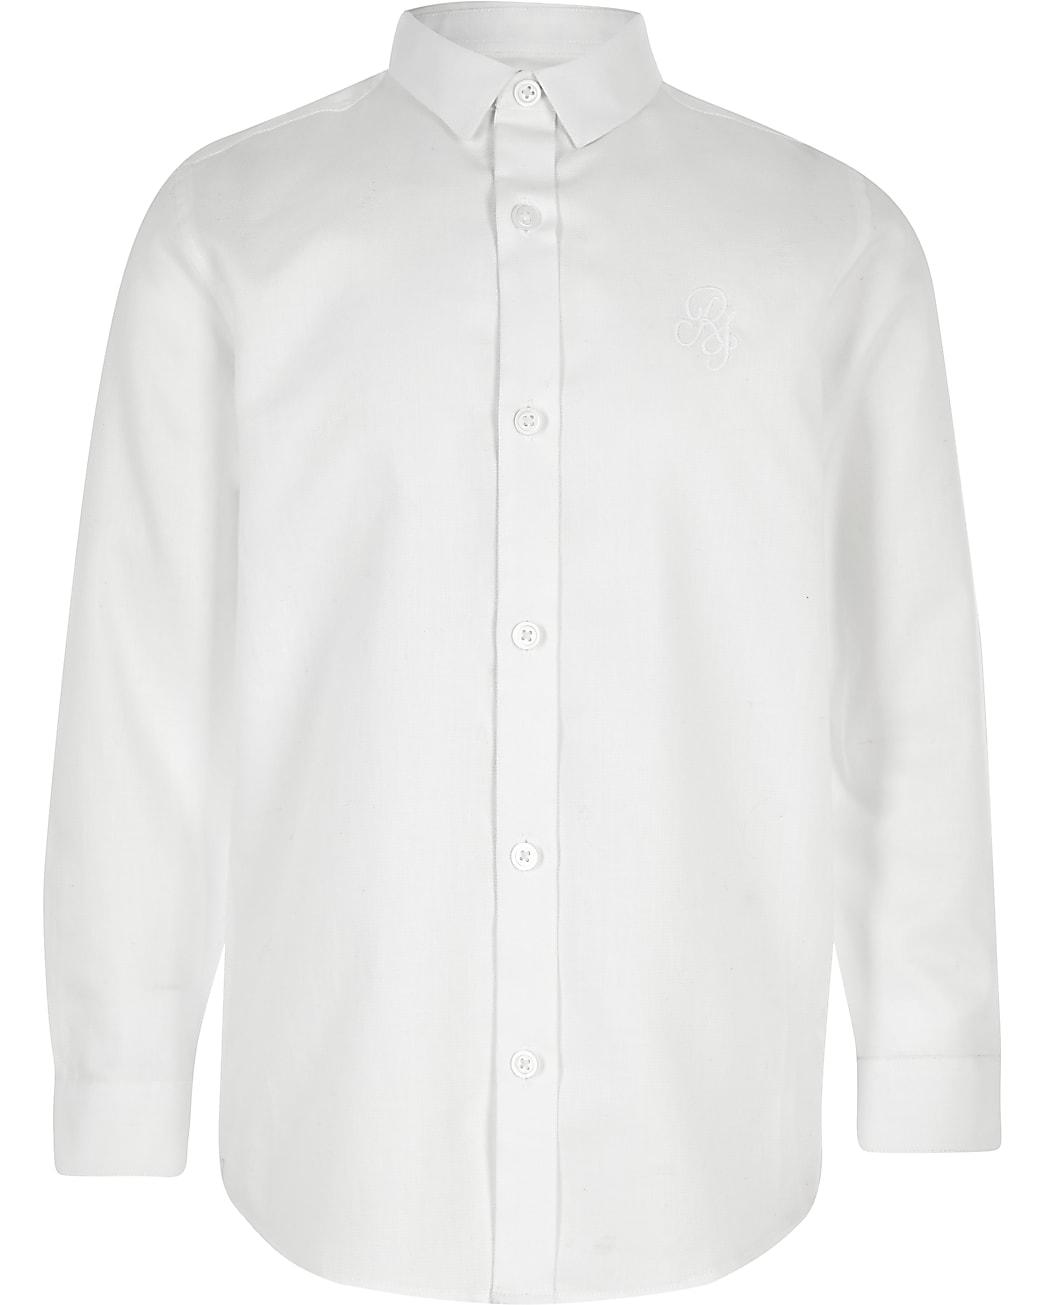 Boys white RI long sleeve shirt